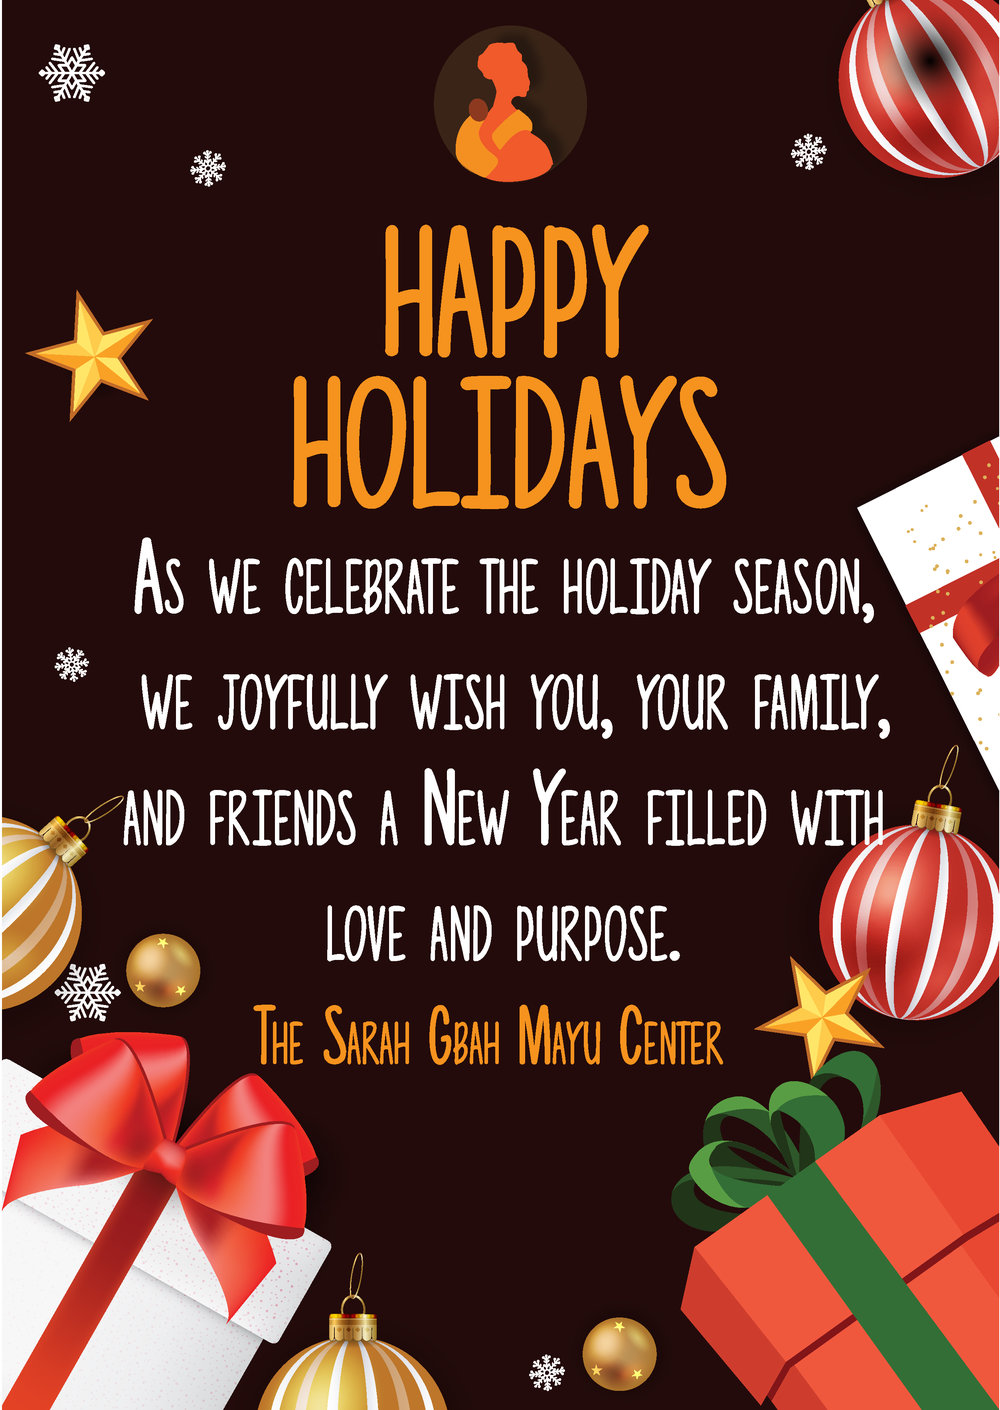 Seasons Greetings The Sarah Gbah Mayu Center